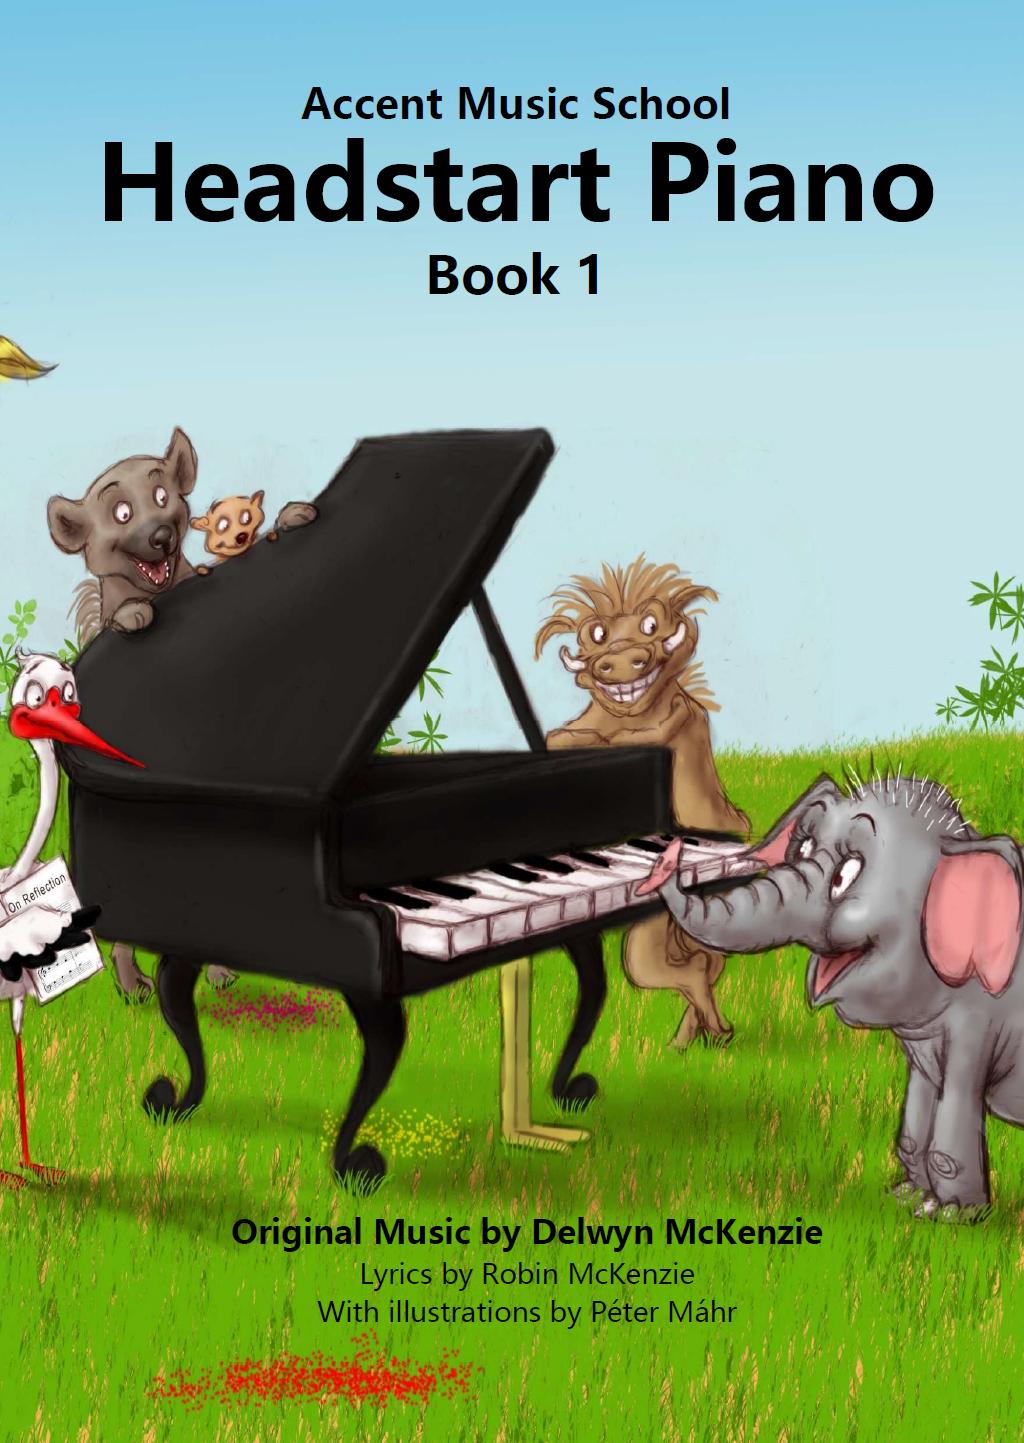 Headstart piano book 1